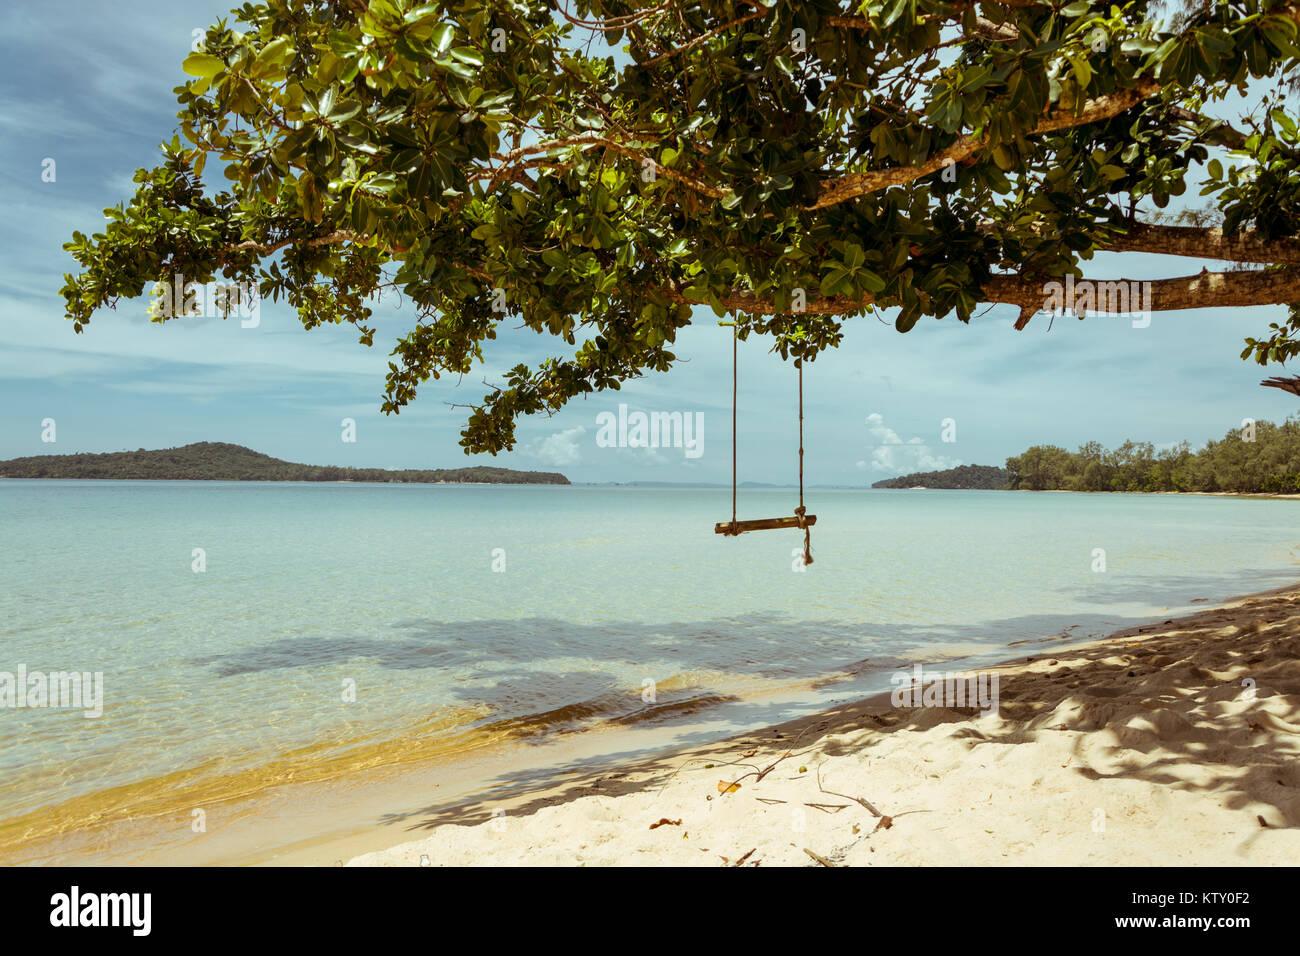 Paradise swing on a Cambodian Island near Sihanoukville. - Stock Image